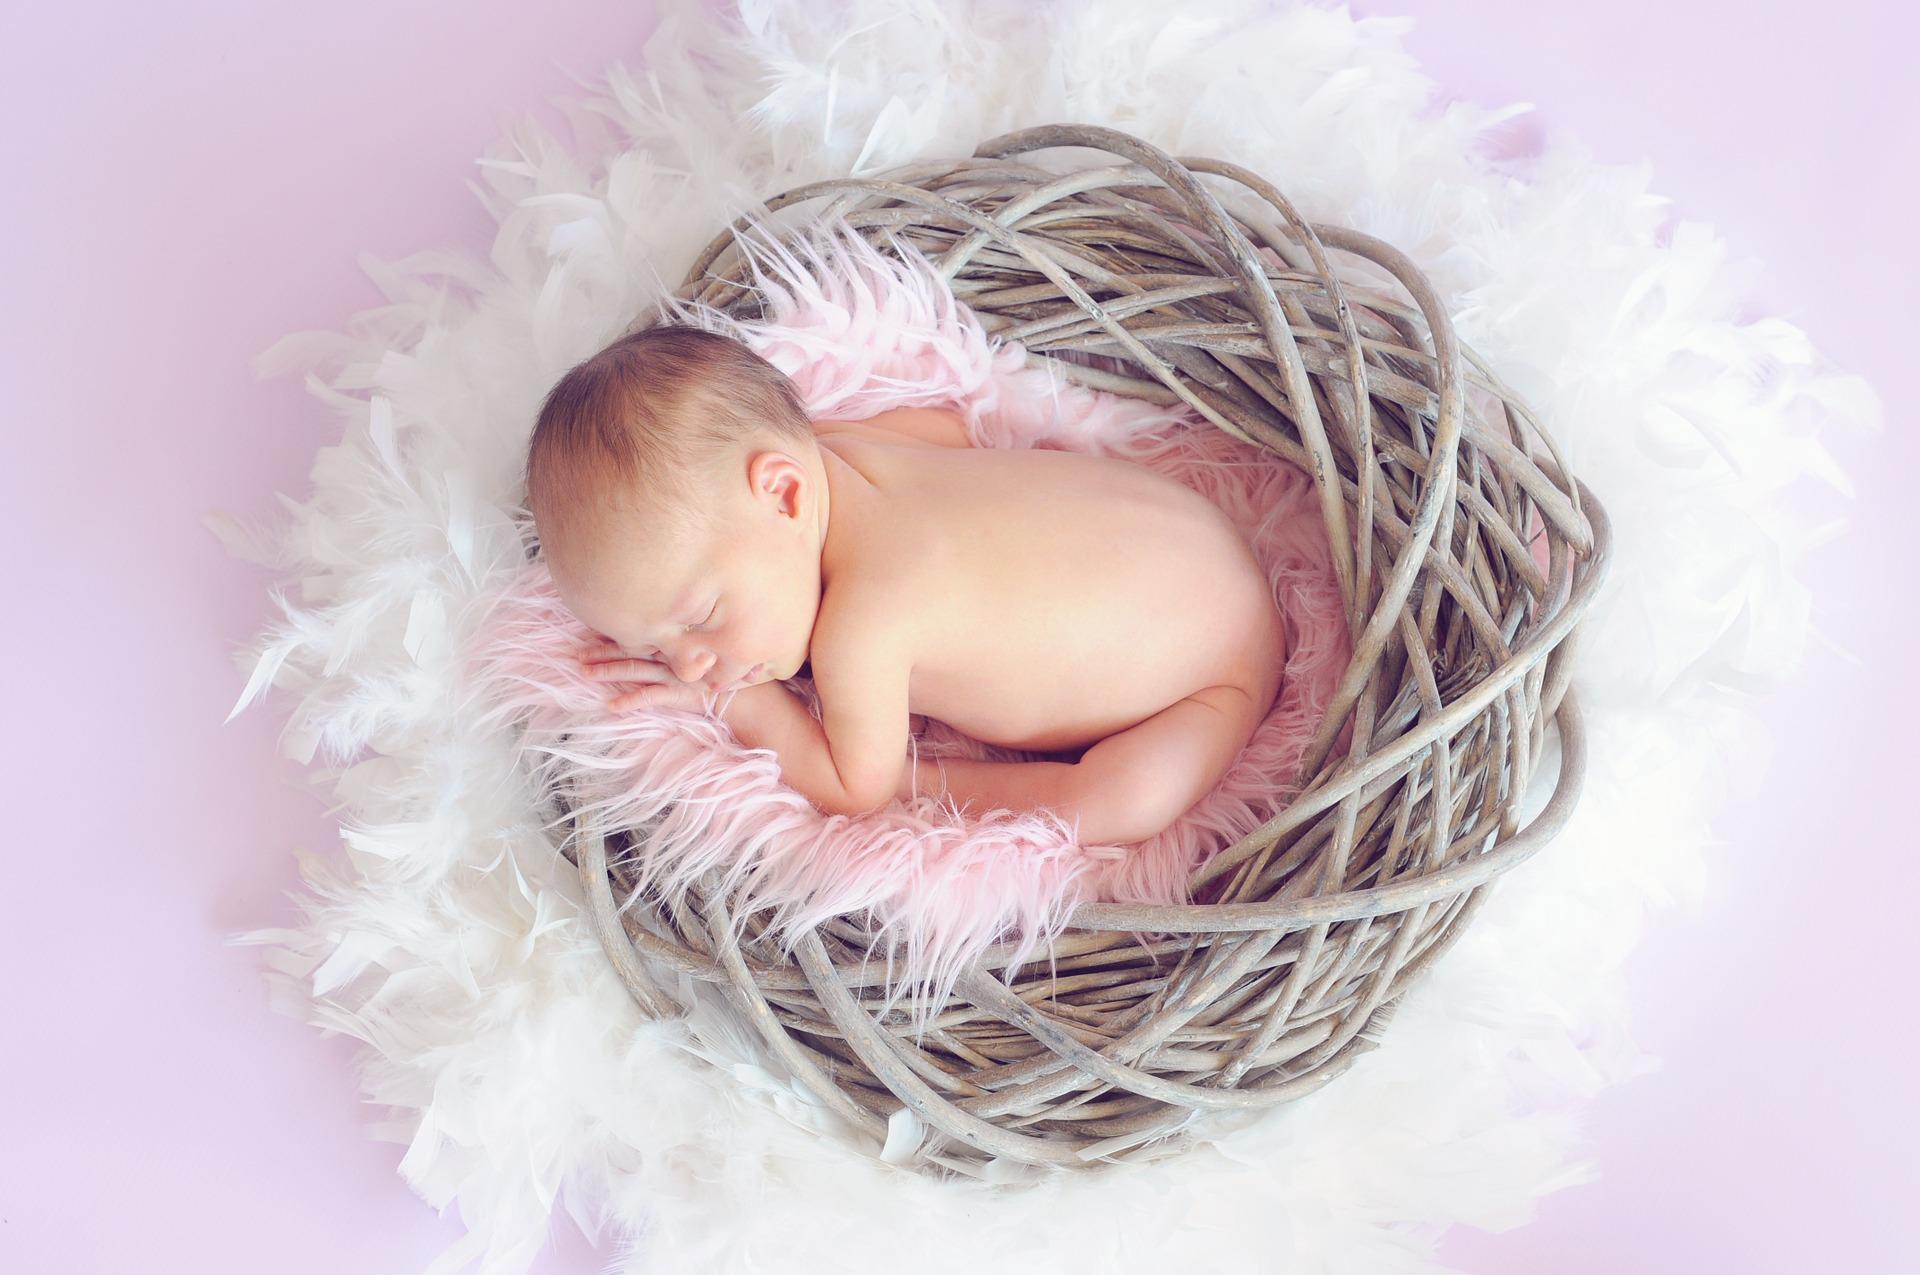 Kinderyoga, Babymassage, Geschwisterkurse und Kindermentaltraining